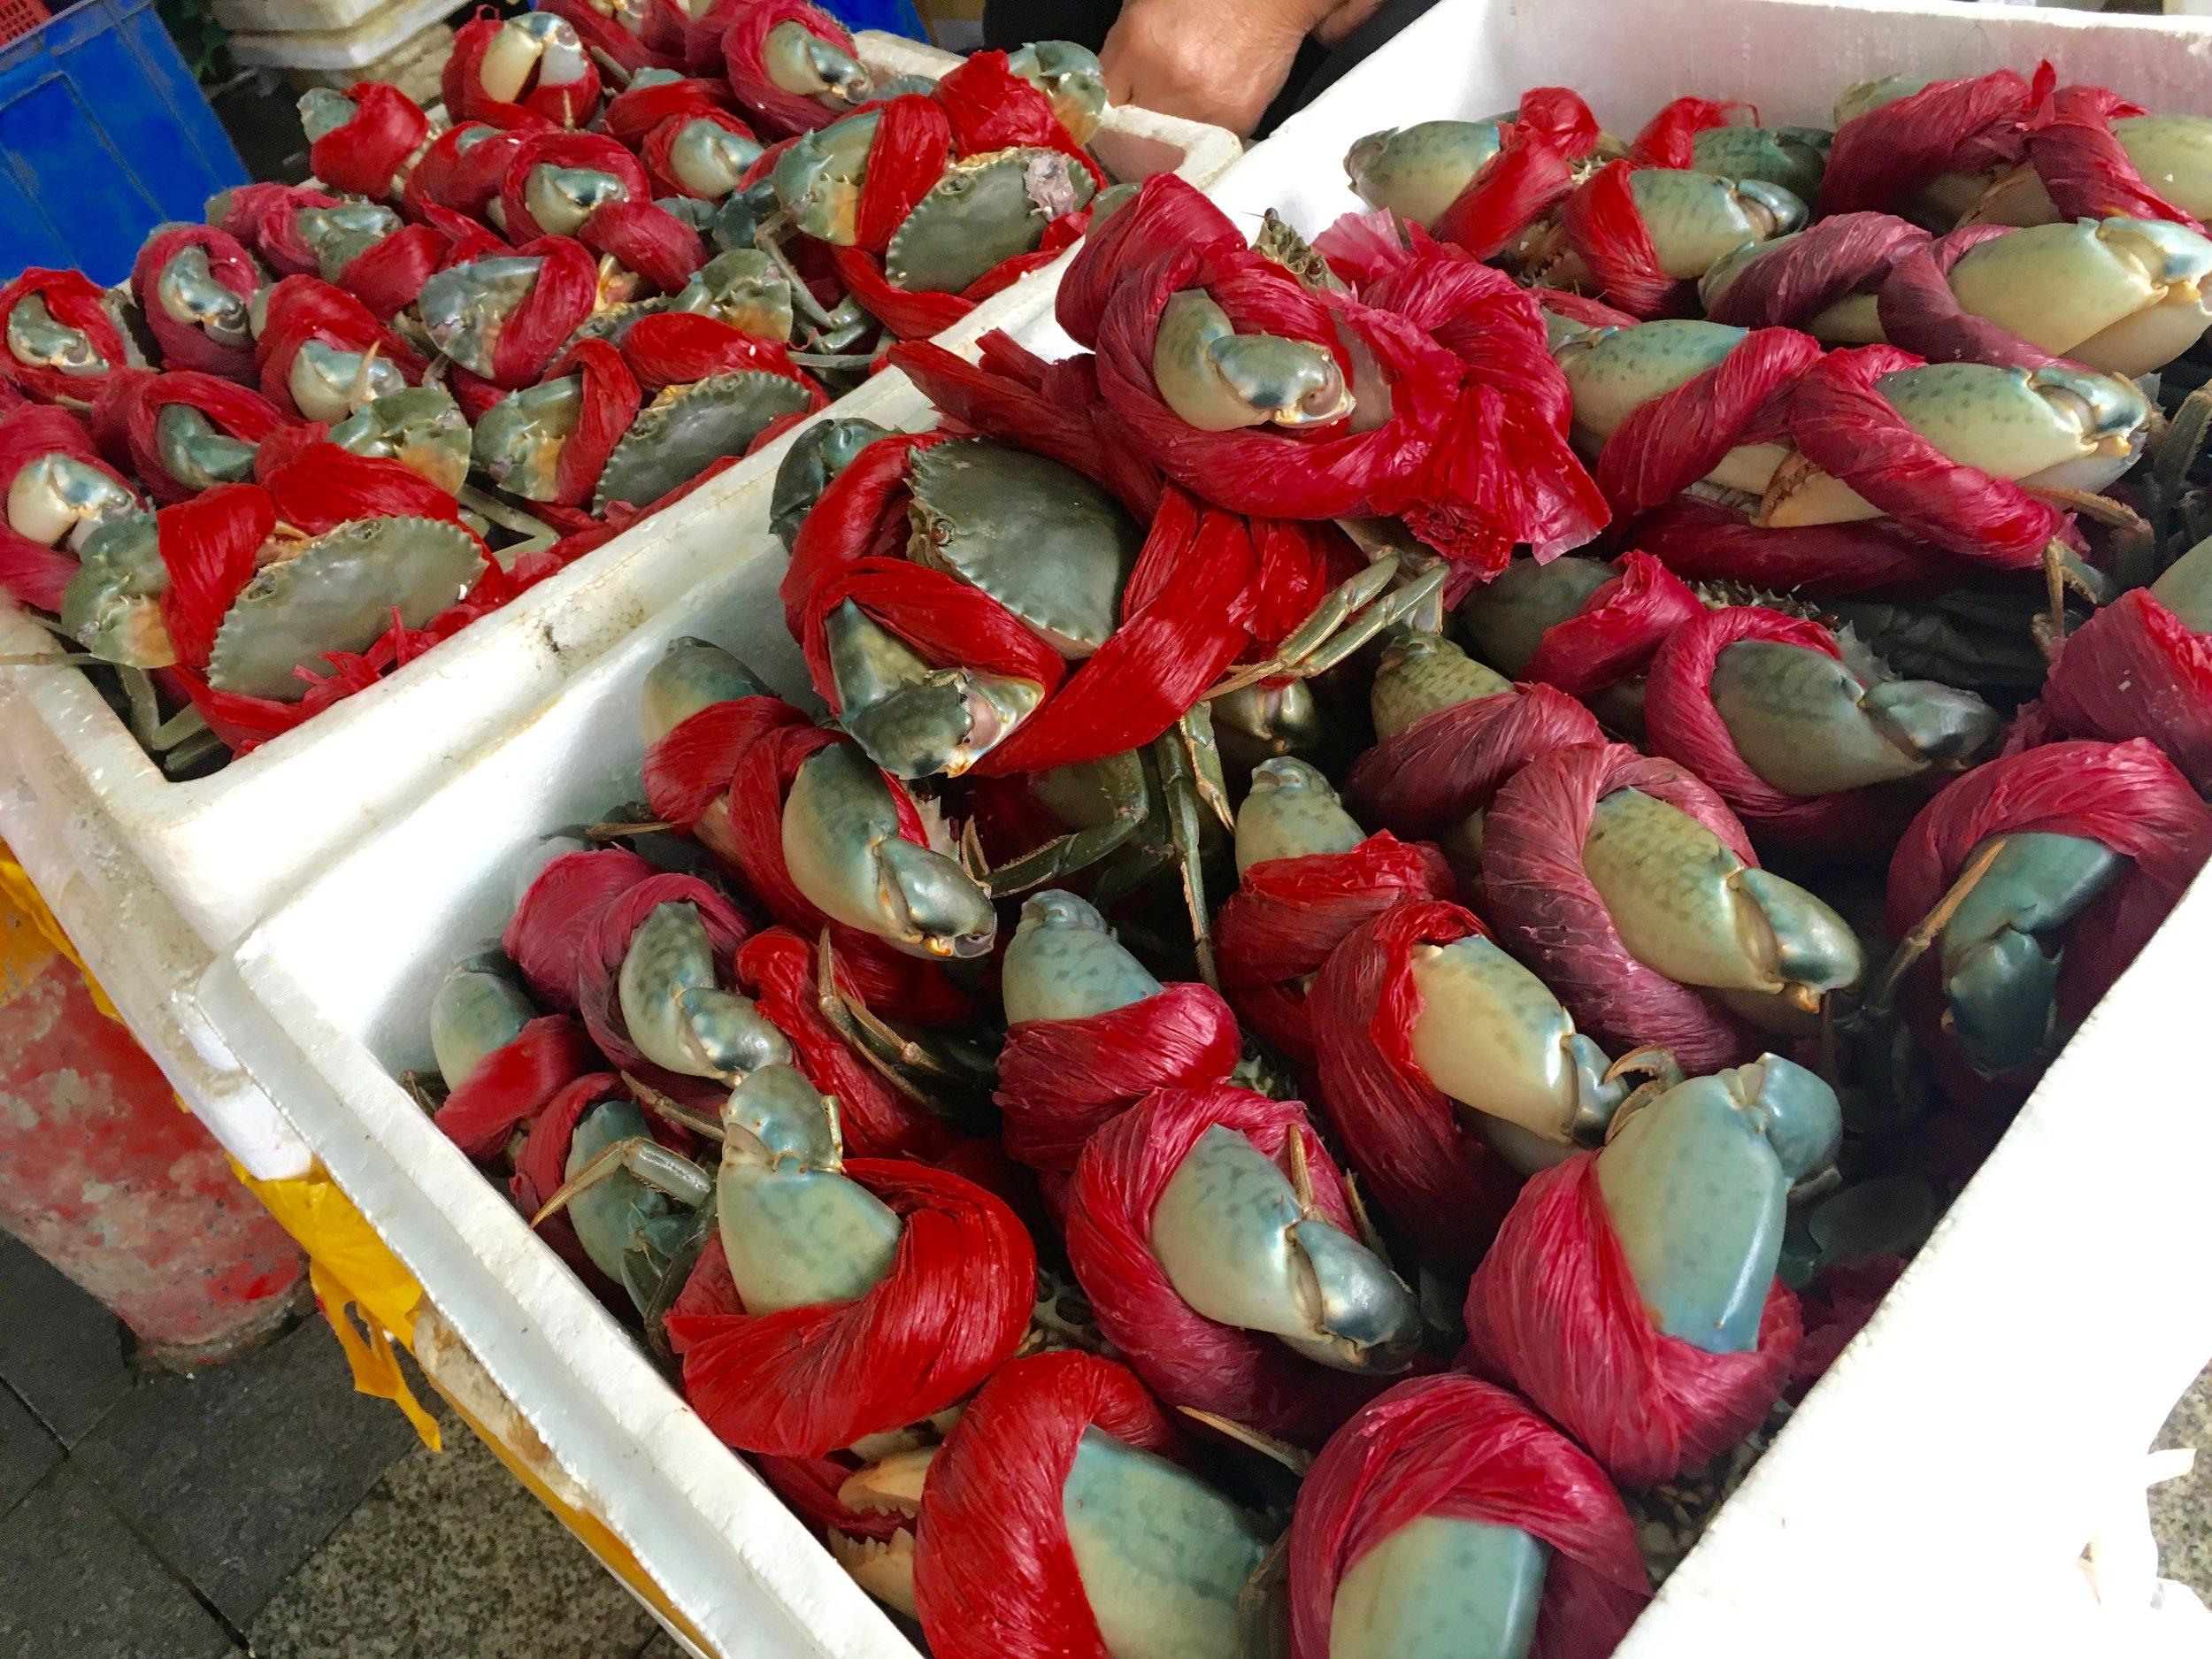 Crab claws, I presume.